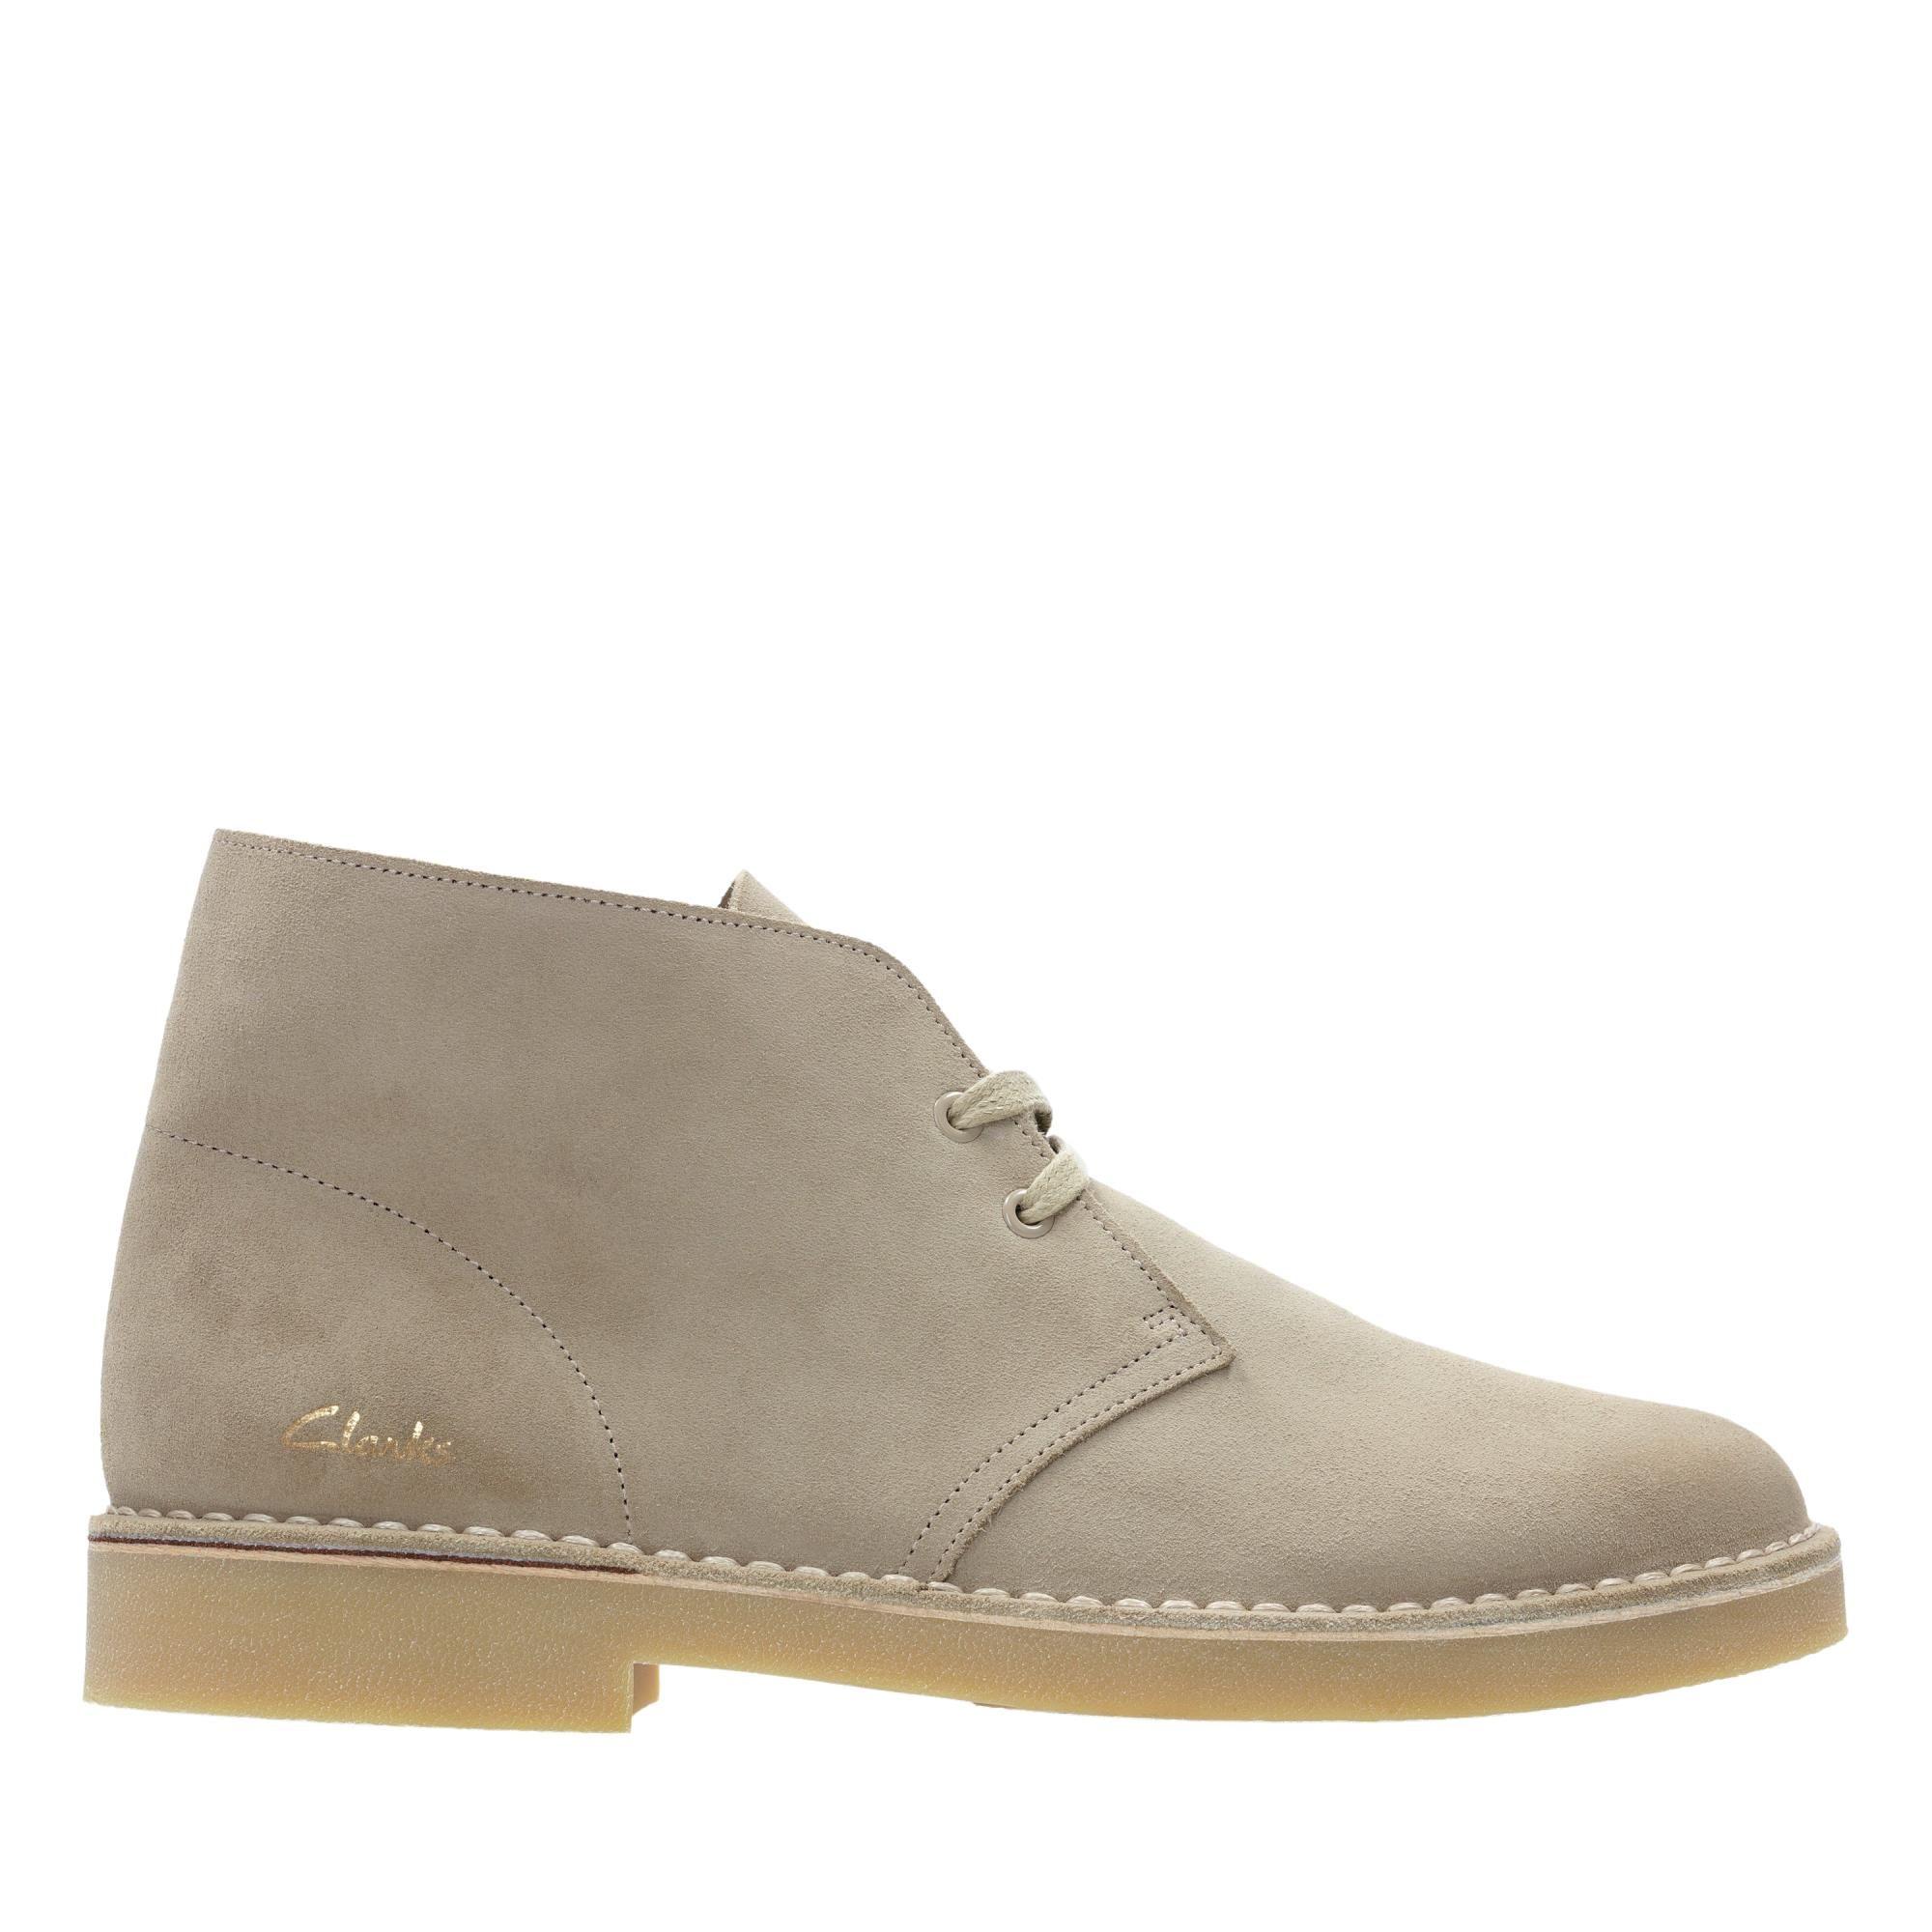 Clarks Desert Boot 2 26155495 Sand Suede